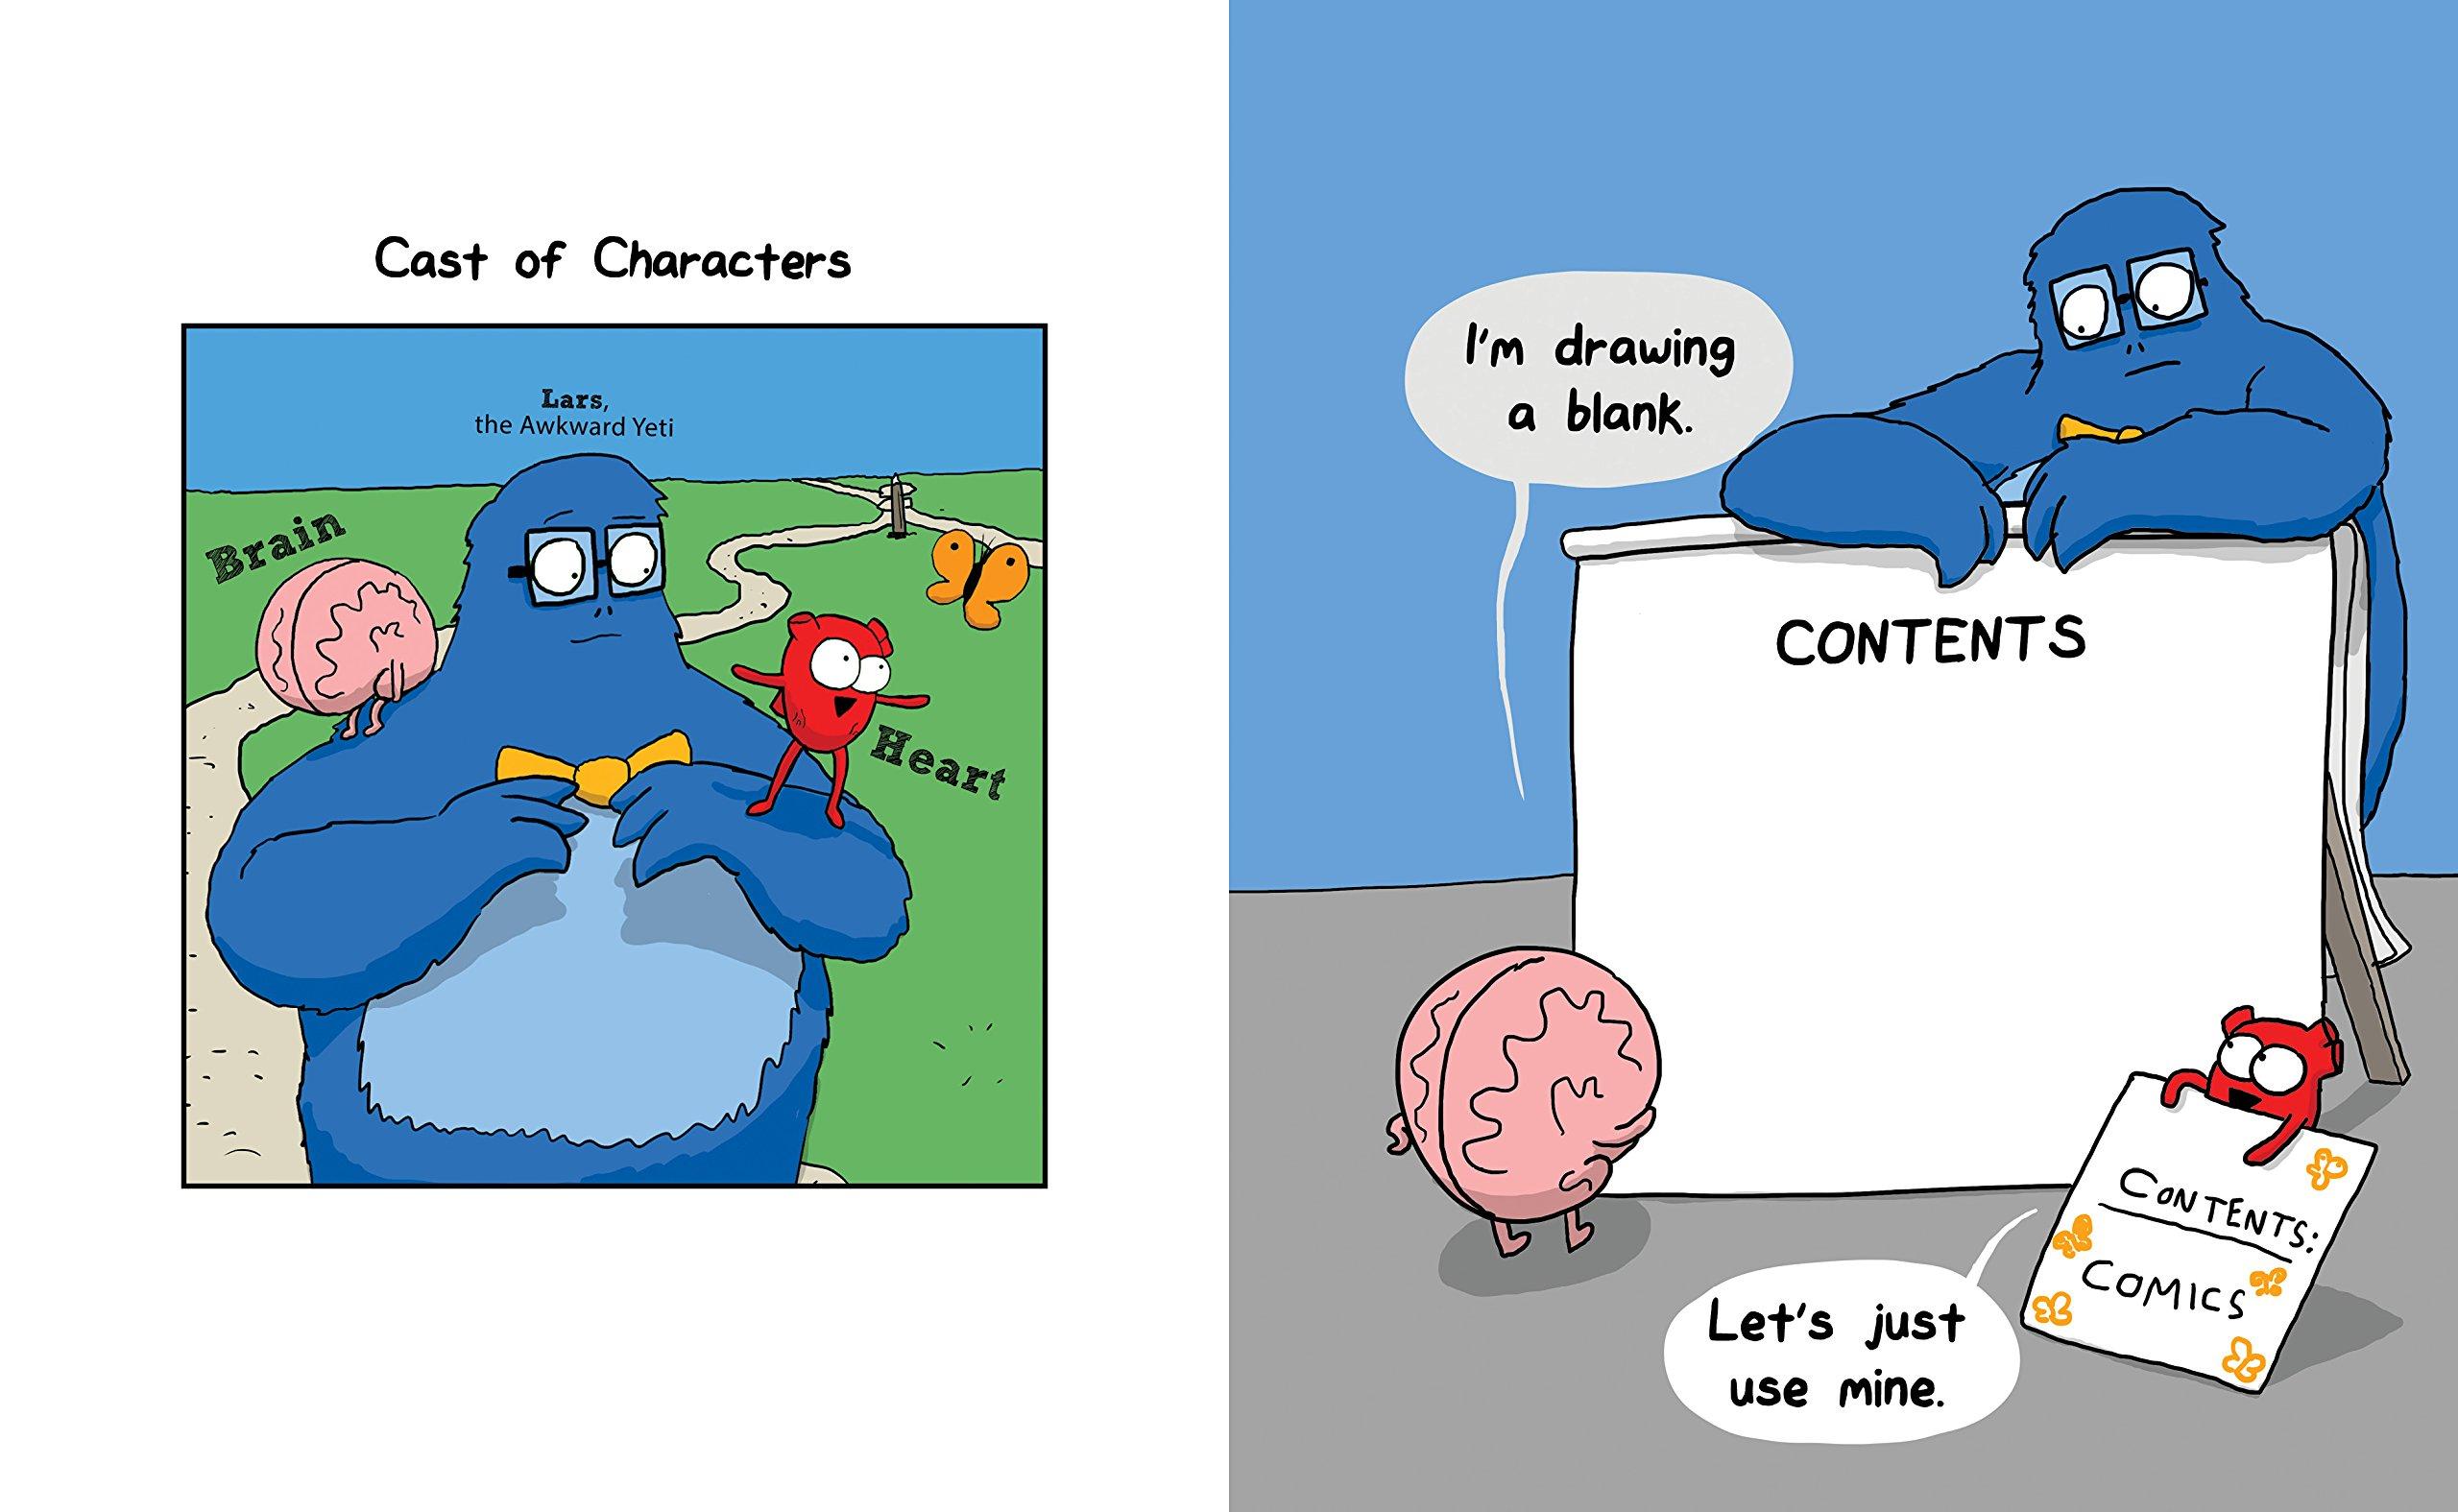 Drawn brain comic Com: Awkward An Yeti 0050837347786: